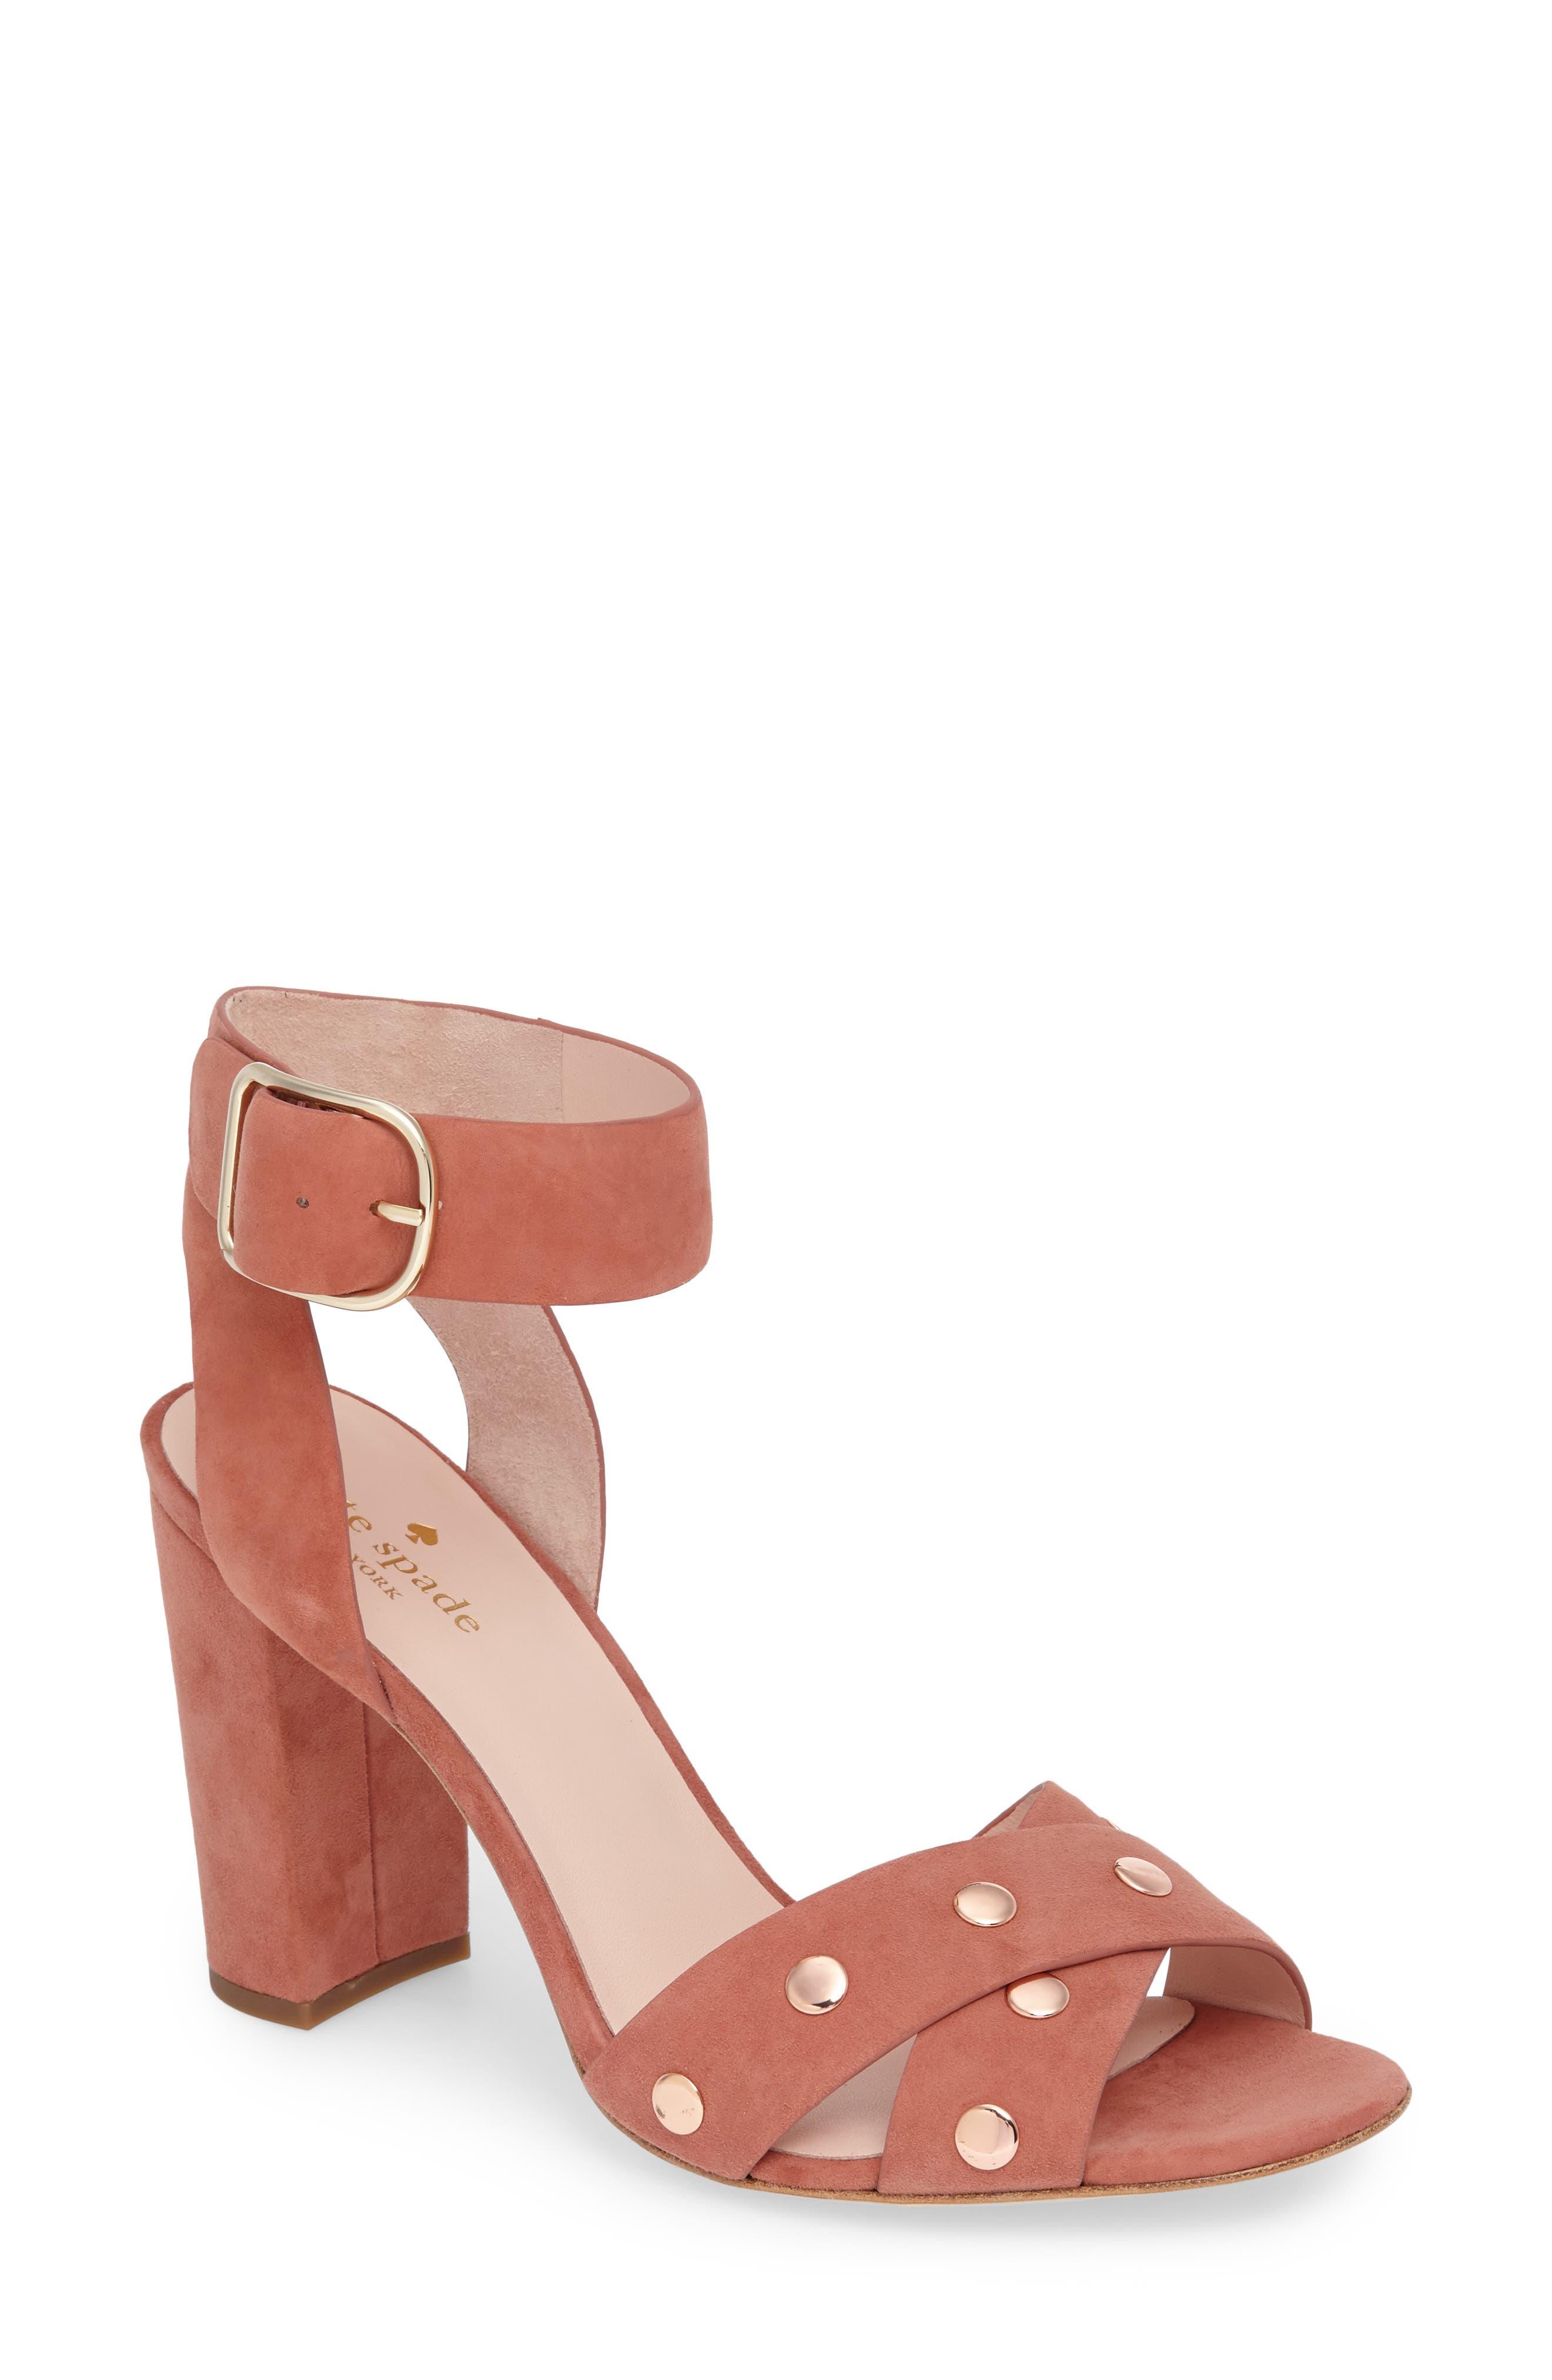 Alternate Image 1 Selected - kate spade new york oakwood sandal (Women)